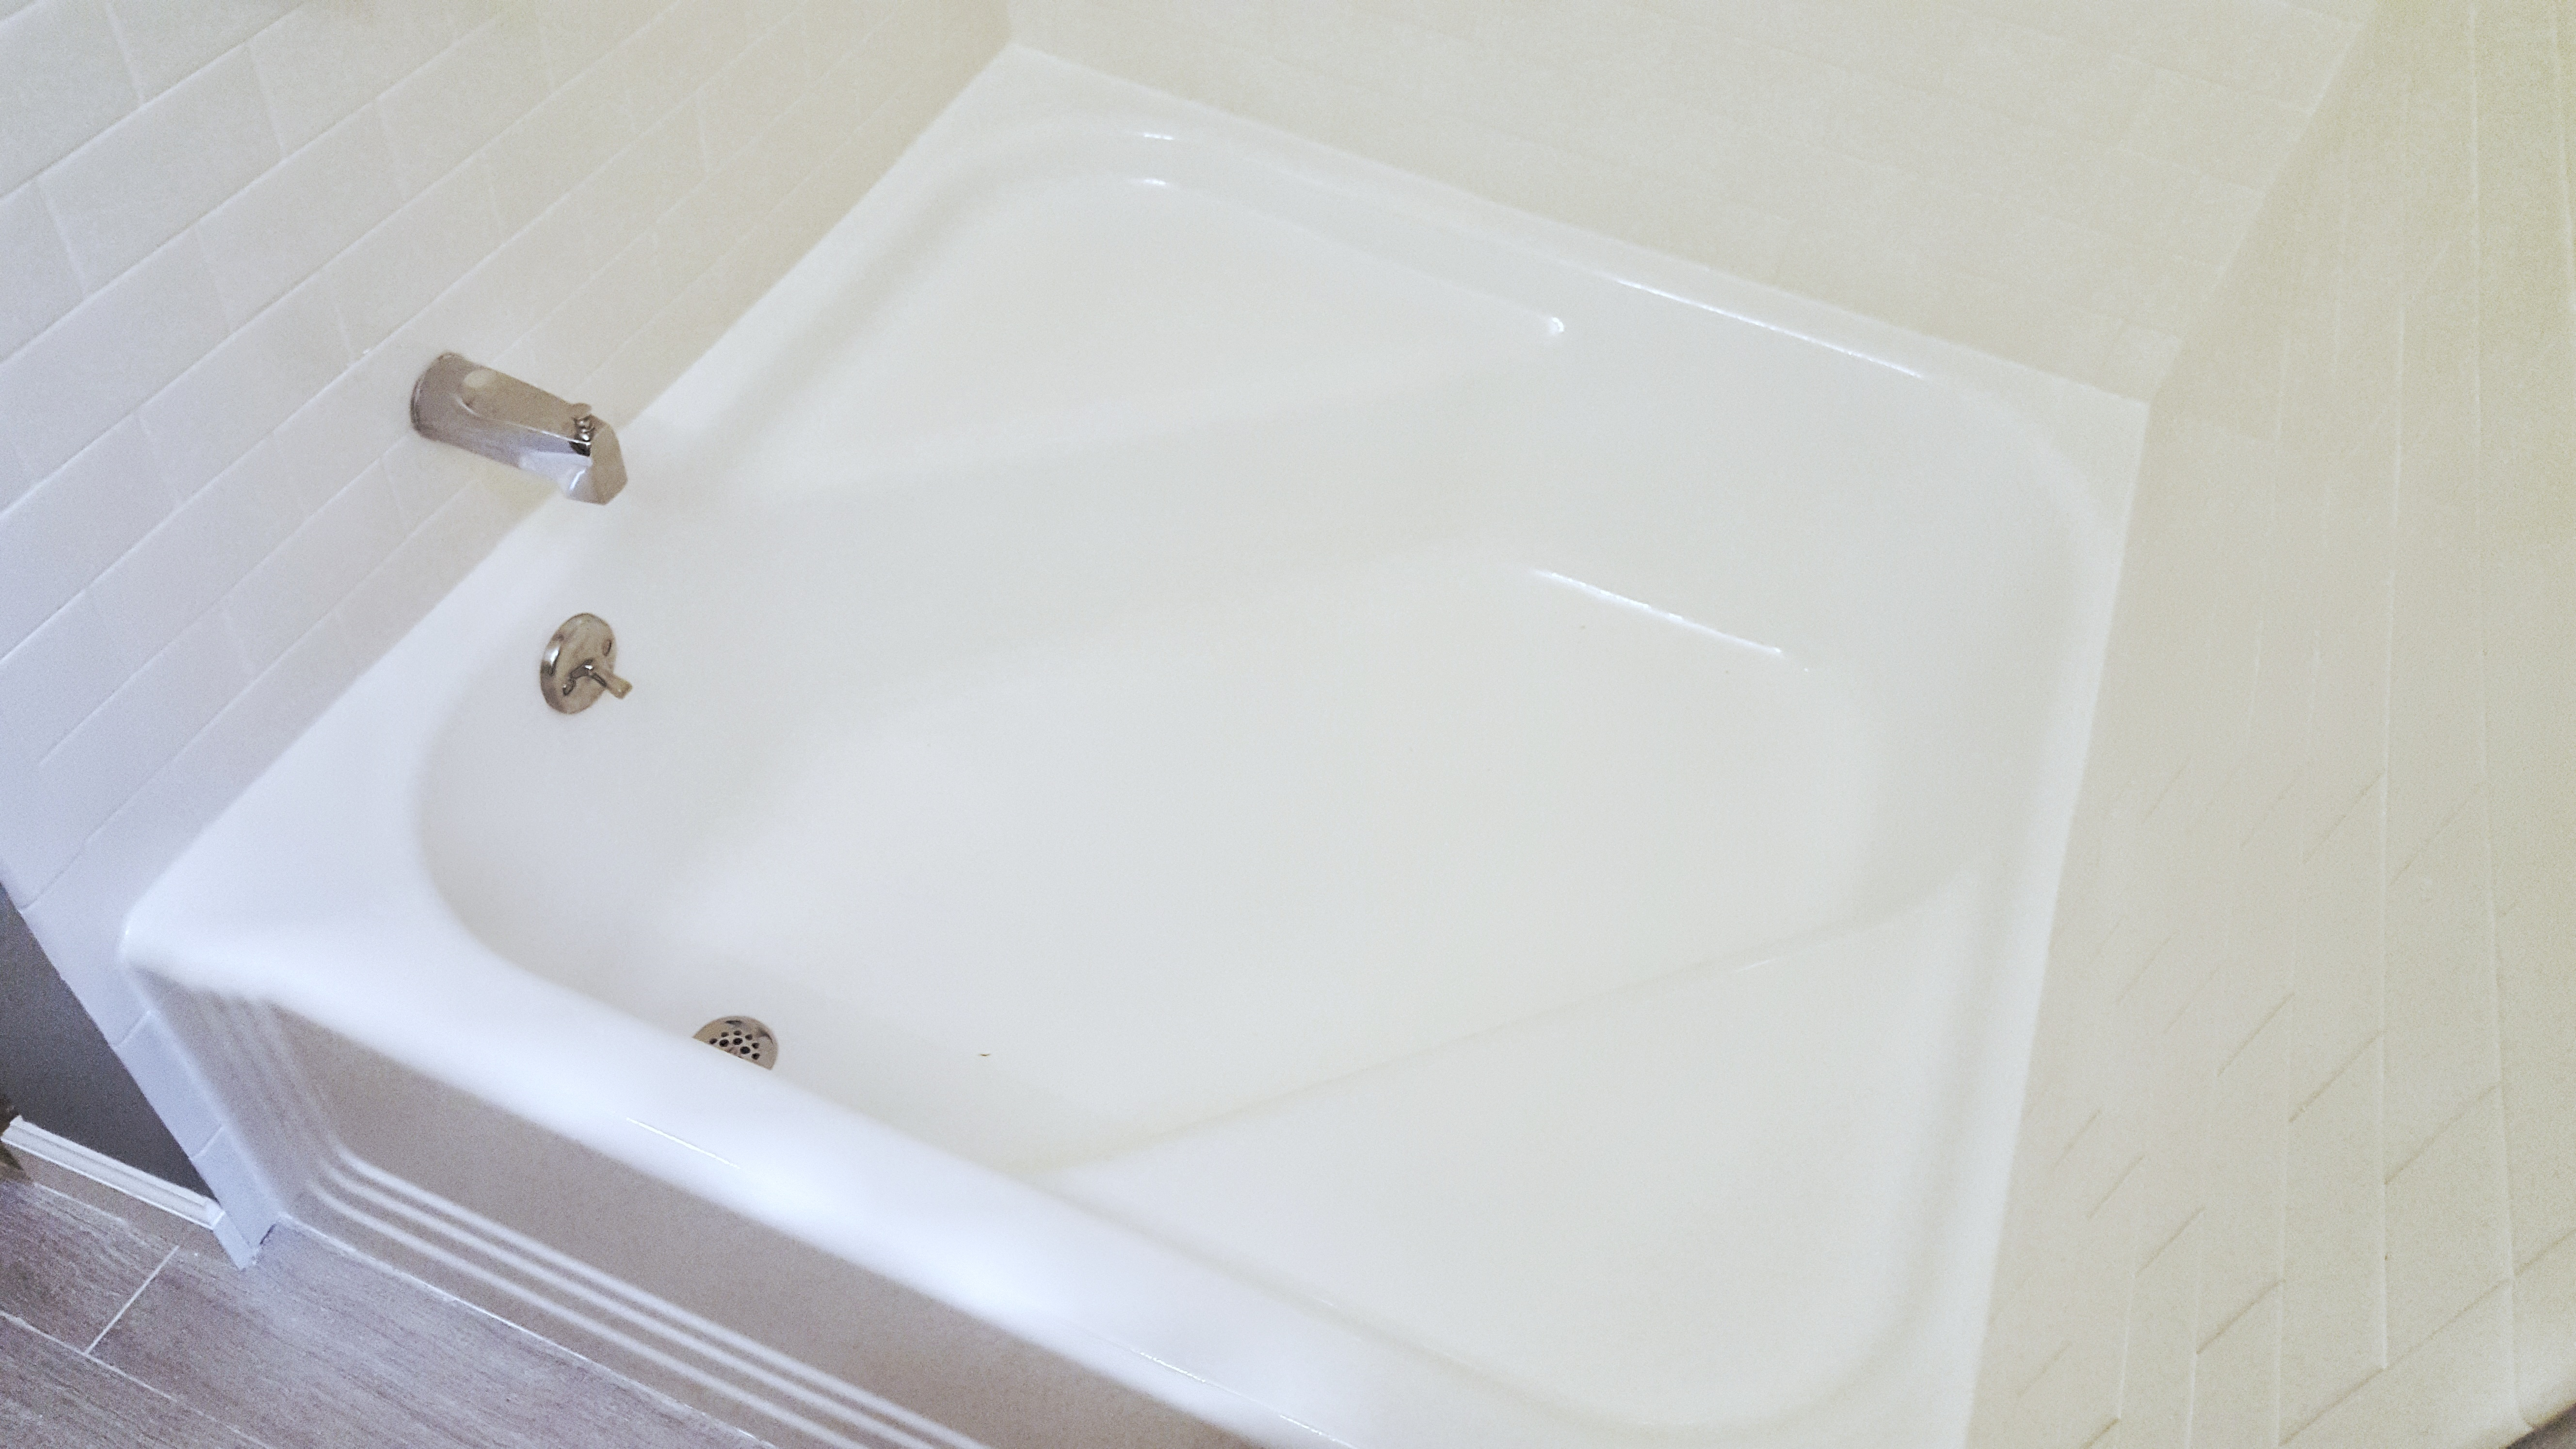 http://www.bathtubdoctor.com/wp-content/uploads/2017/04/20161110_155116-02.jpeg